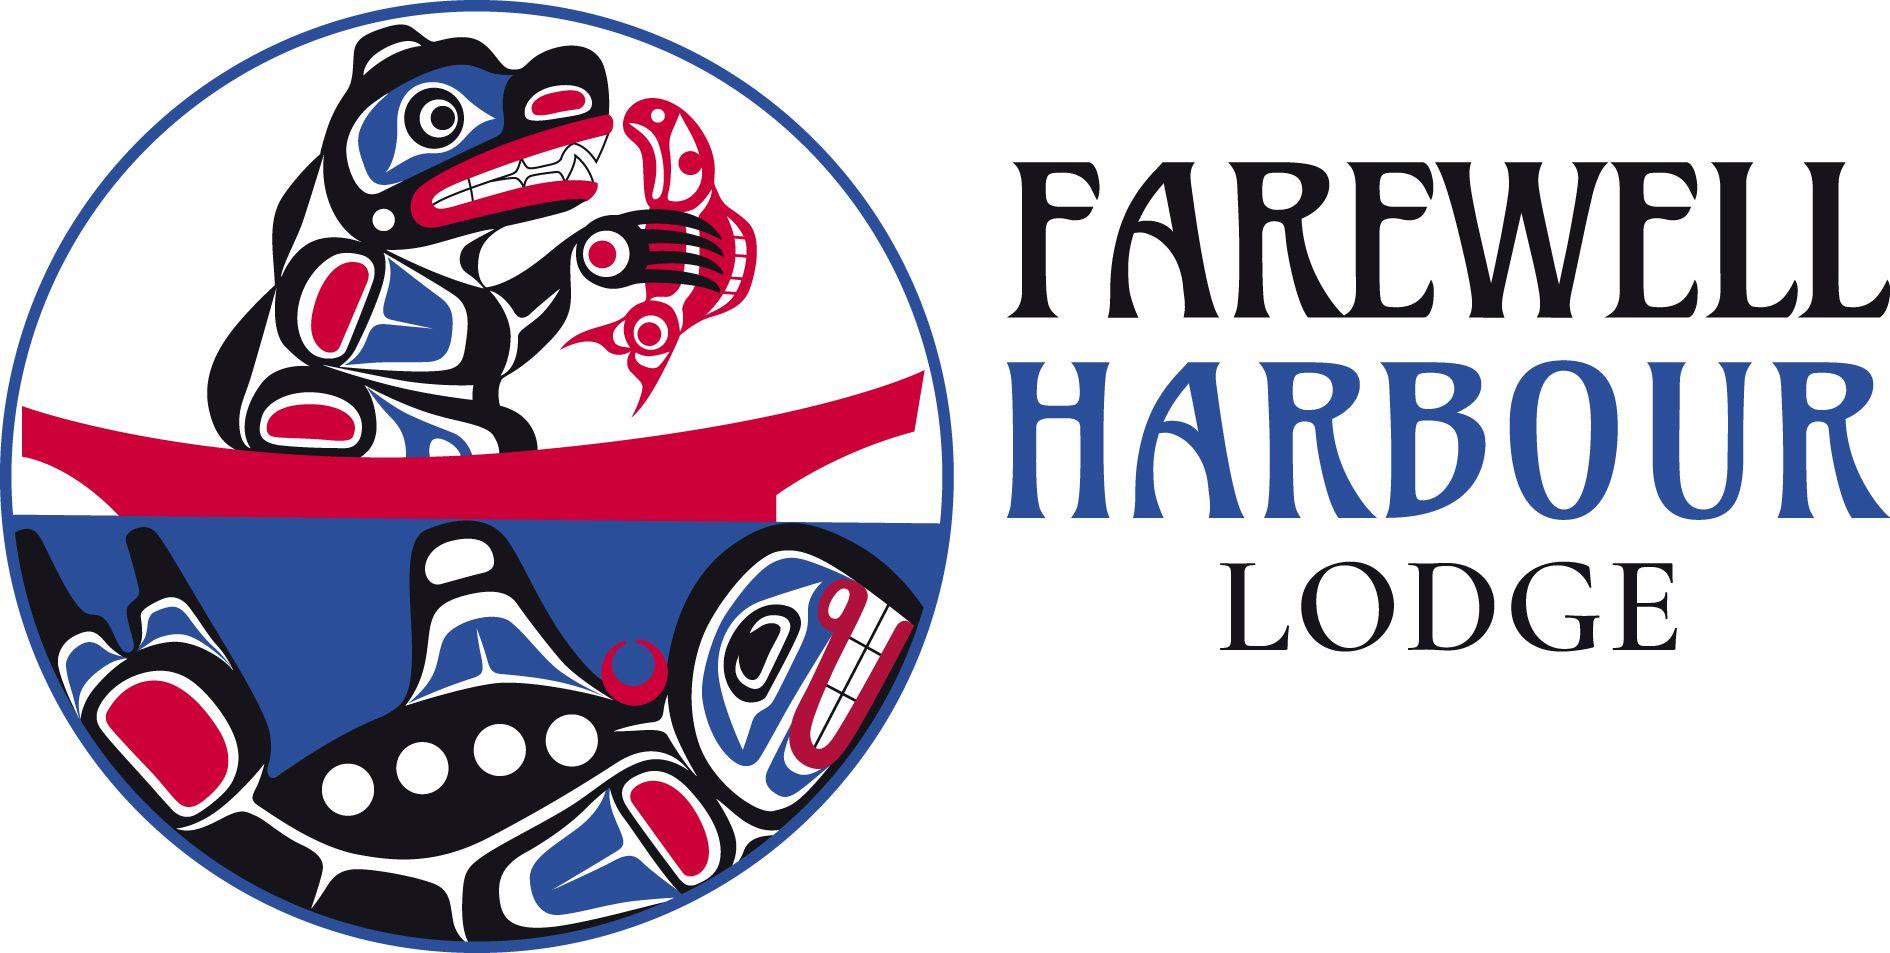 Farewll harbour lodge full colour_LG.jpg